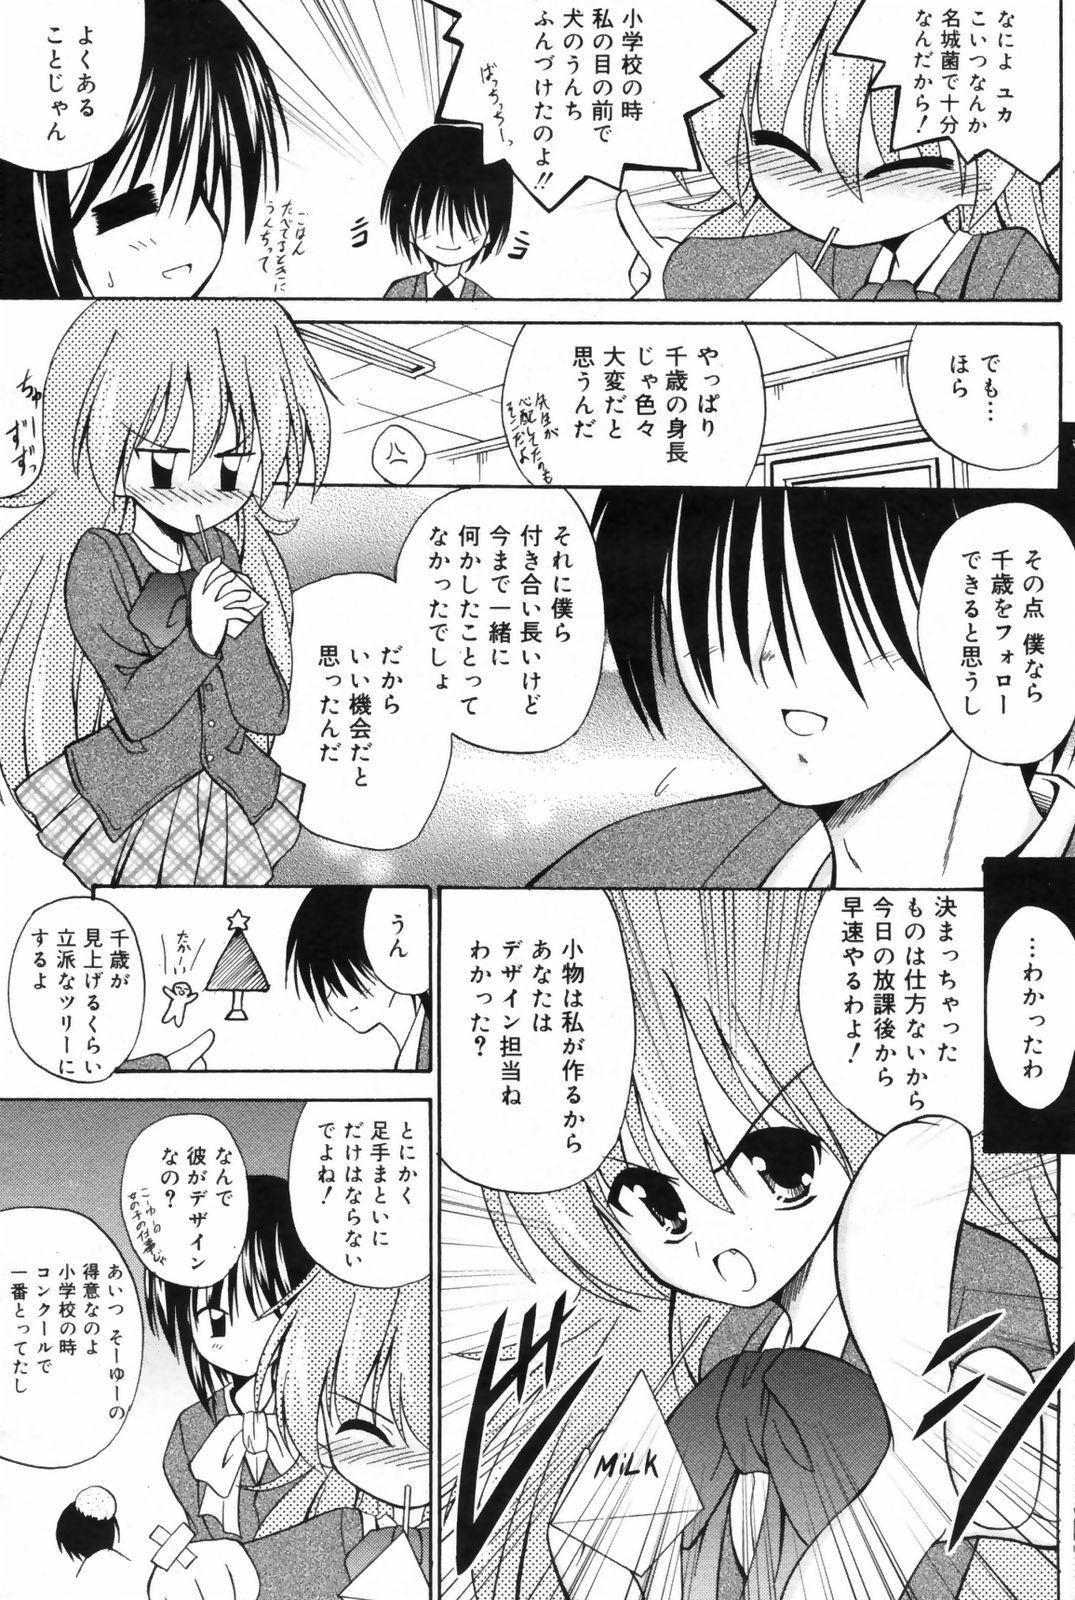 Manga Bangaichi 2009-02 Vol. 234 160